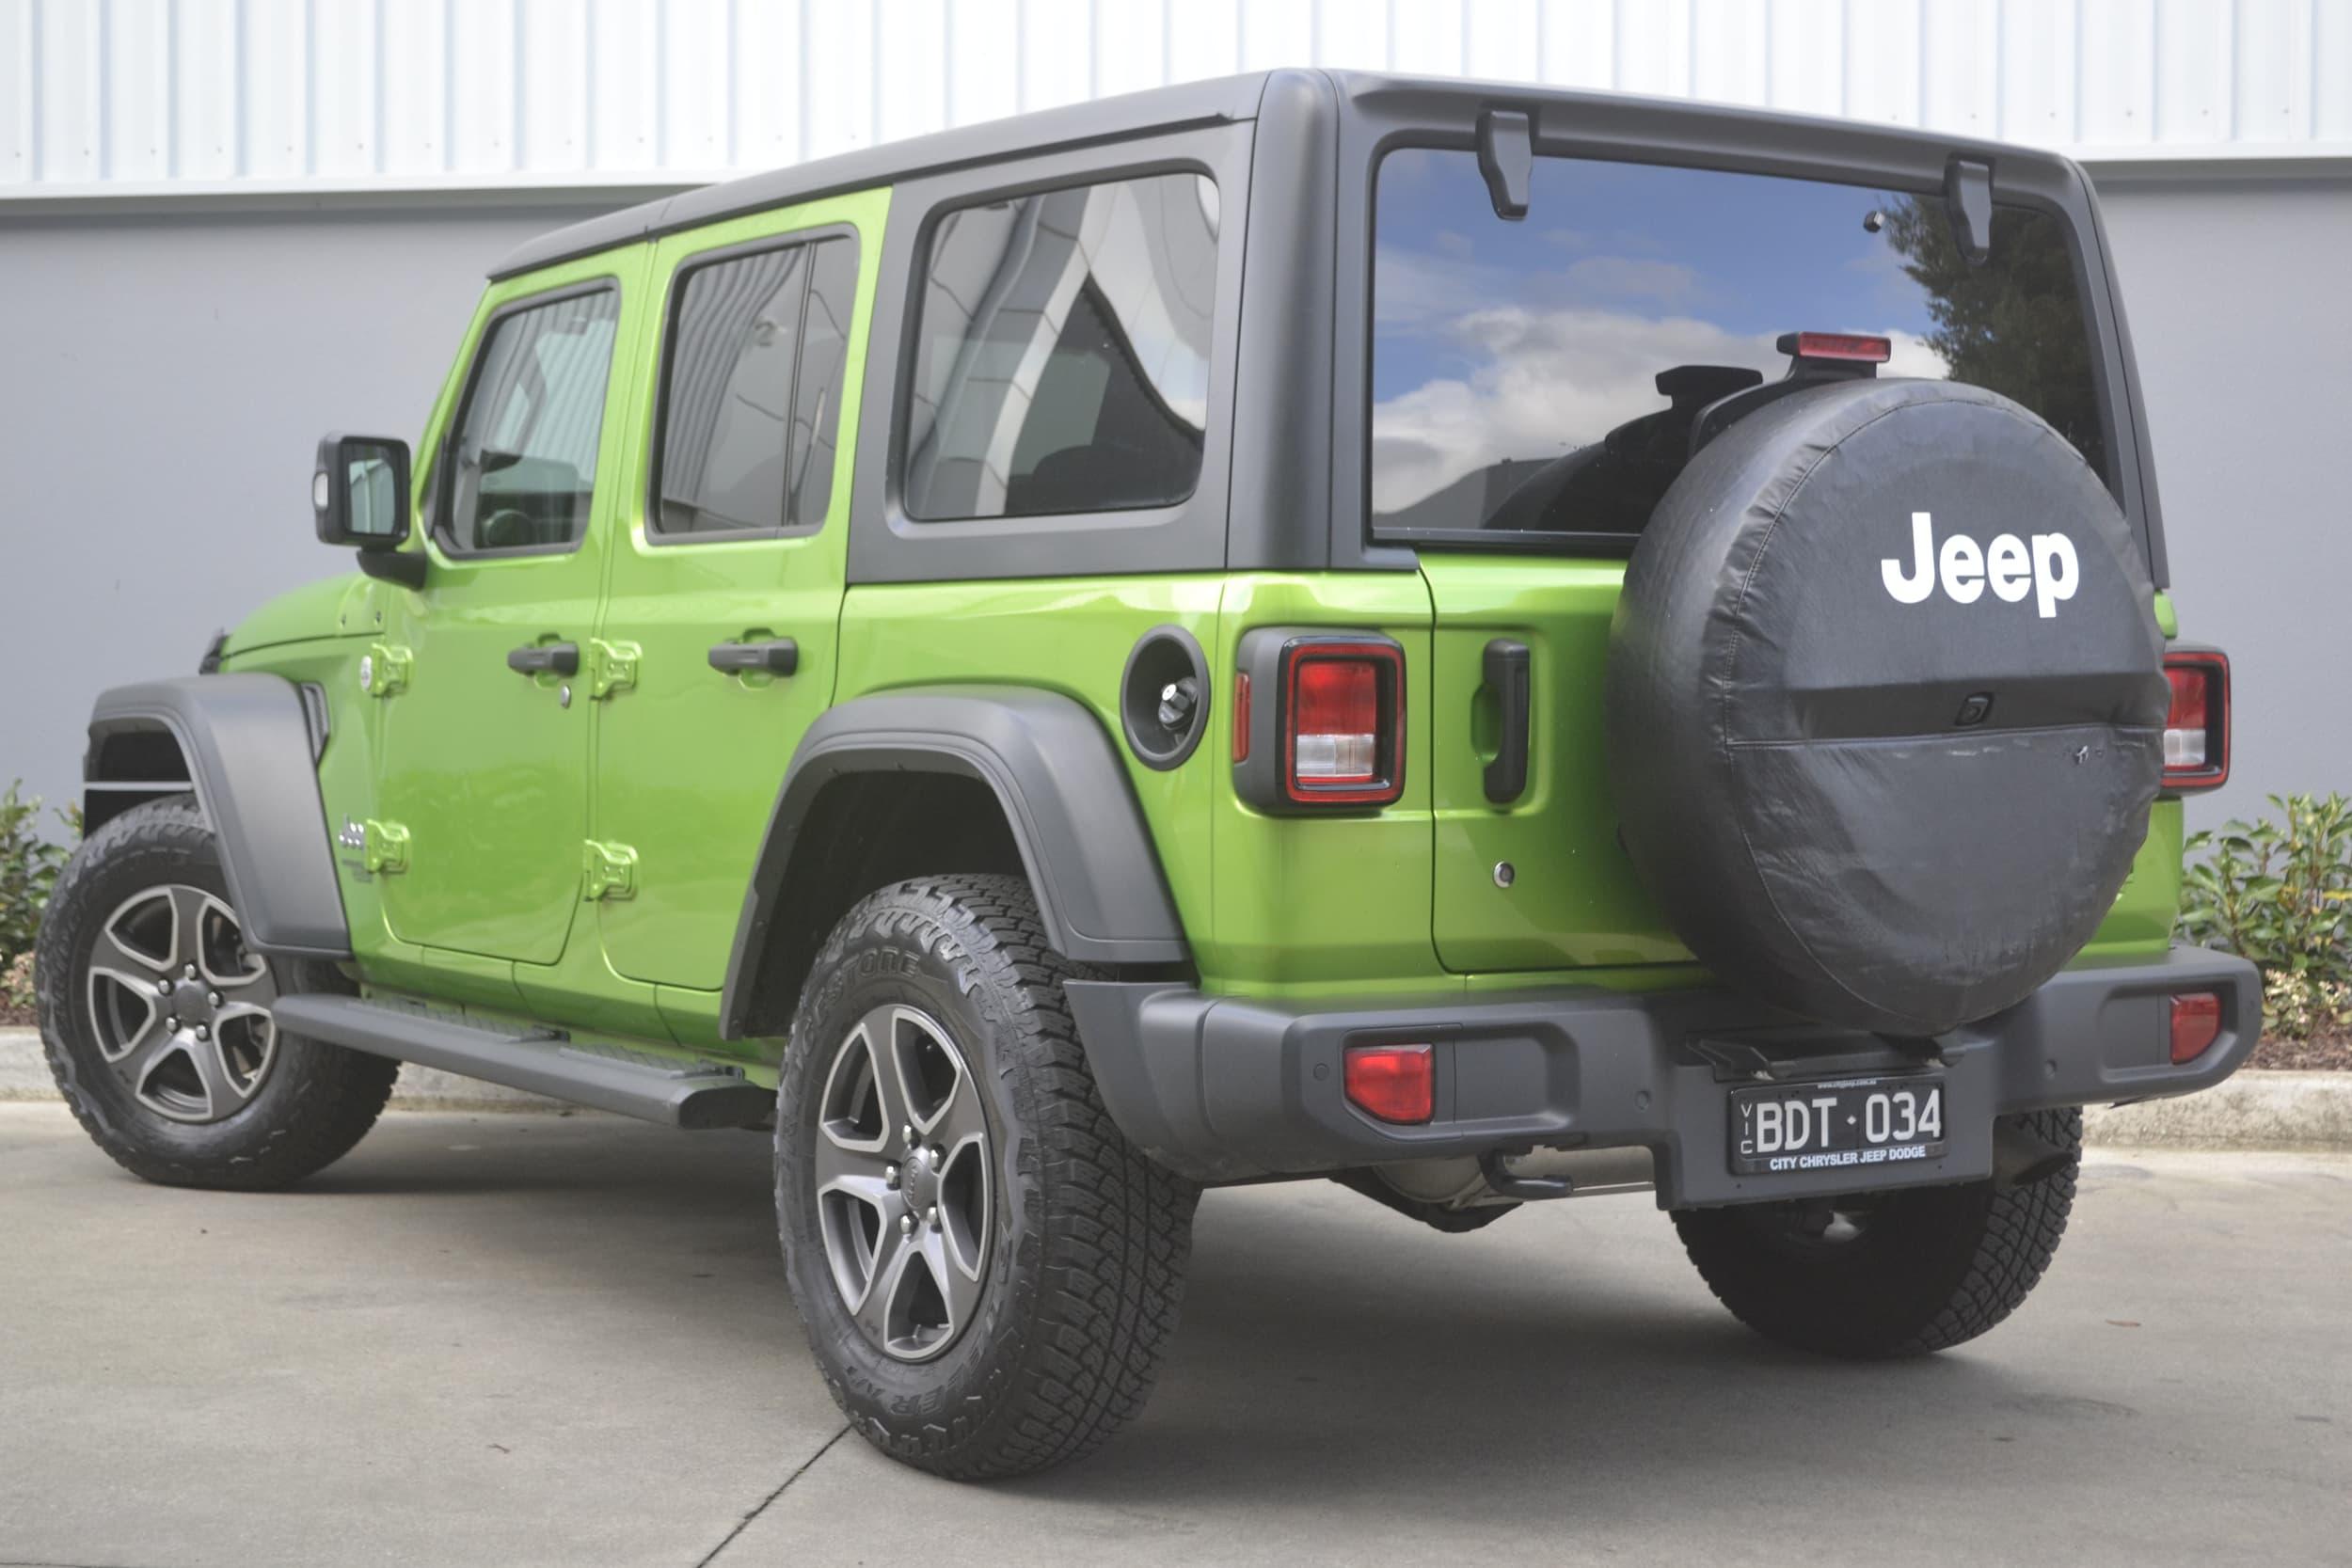 2019 Jeep Wrangler Unlimited Sport S Auto 4x4 MY19 - image 25